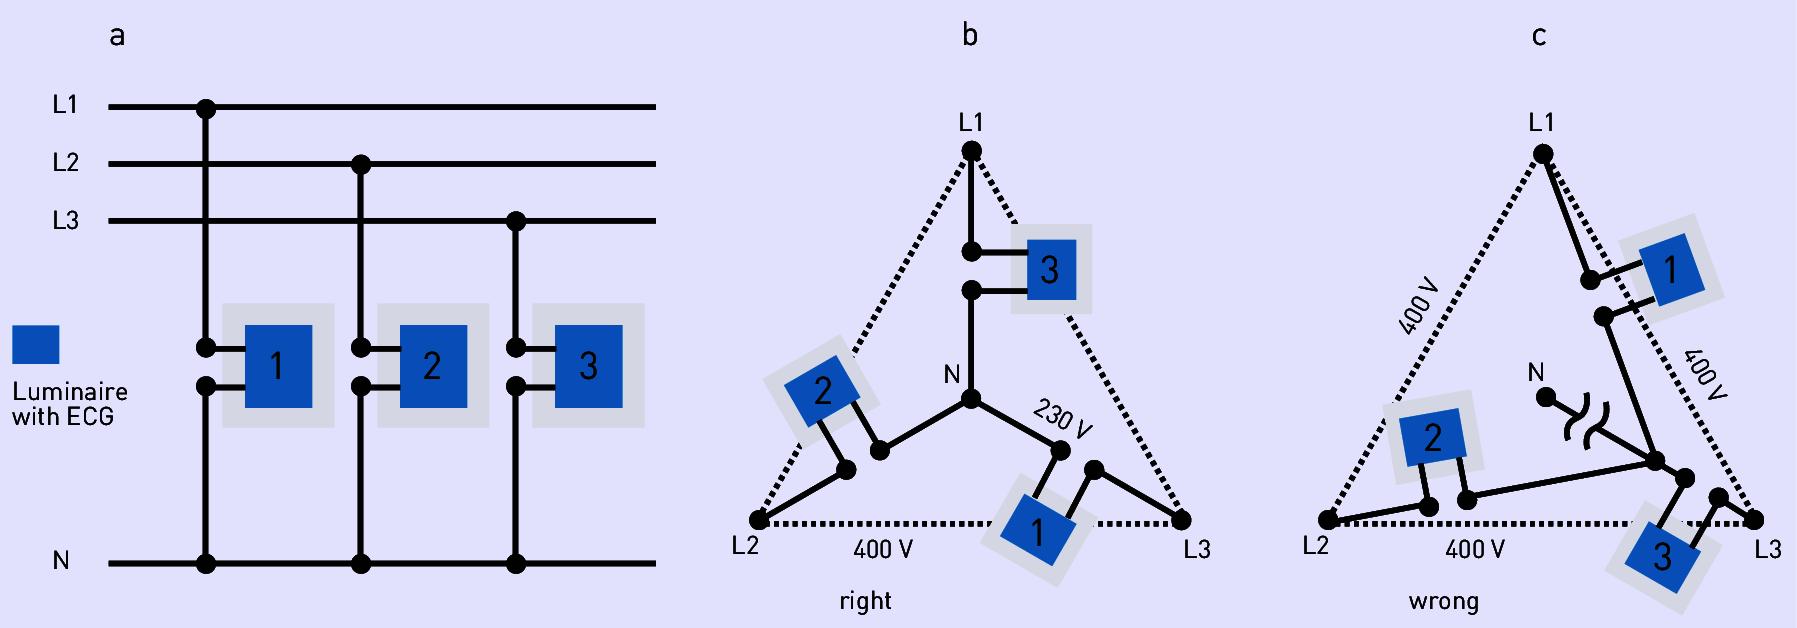 Terrific Neutral Conductor Interruption Wiring Digital Resources Bletukbiperorg